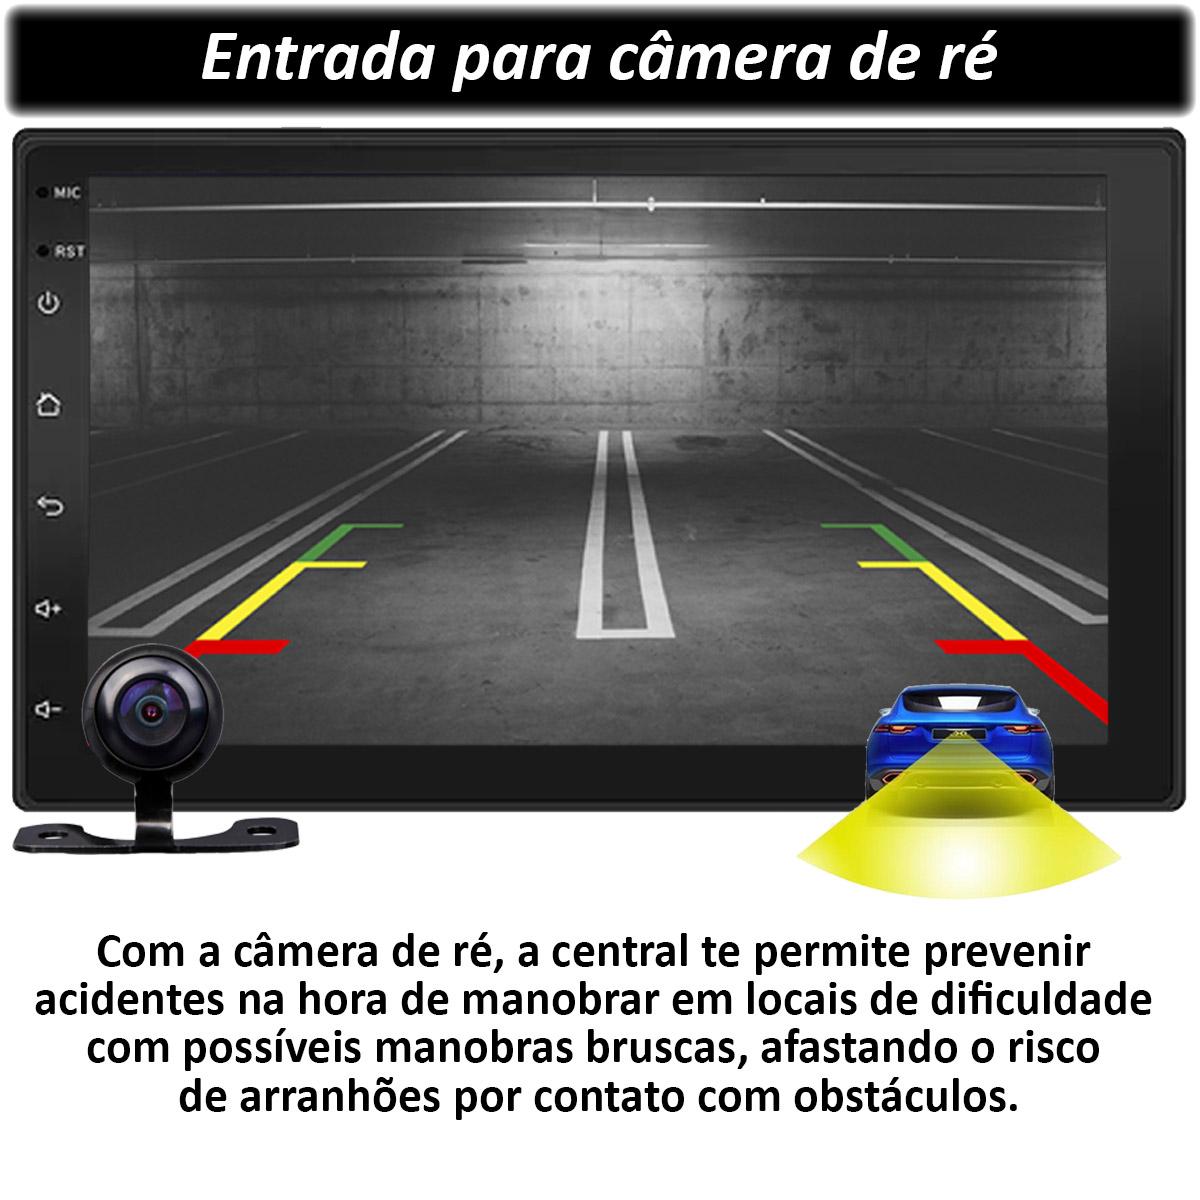 Central Multimídia Volkswagen Gol G4 Muzik Android com Câmera de Ré 7 Polegadas 2 Din Moldura Atacado Poliparts